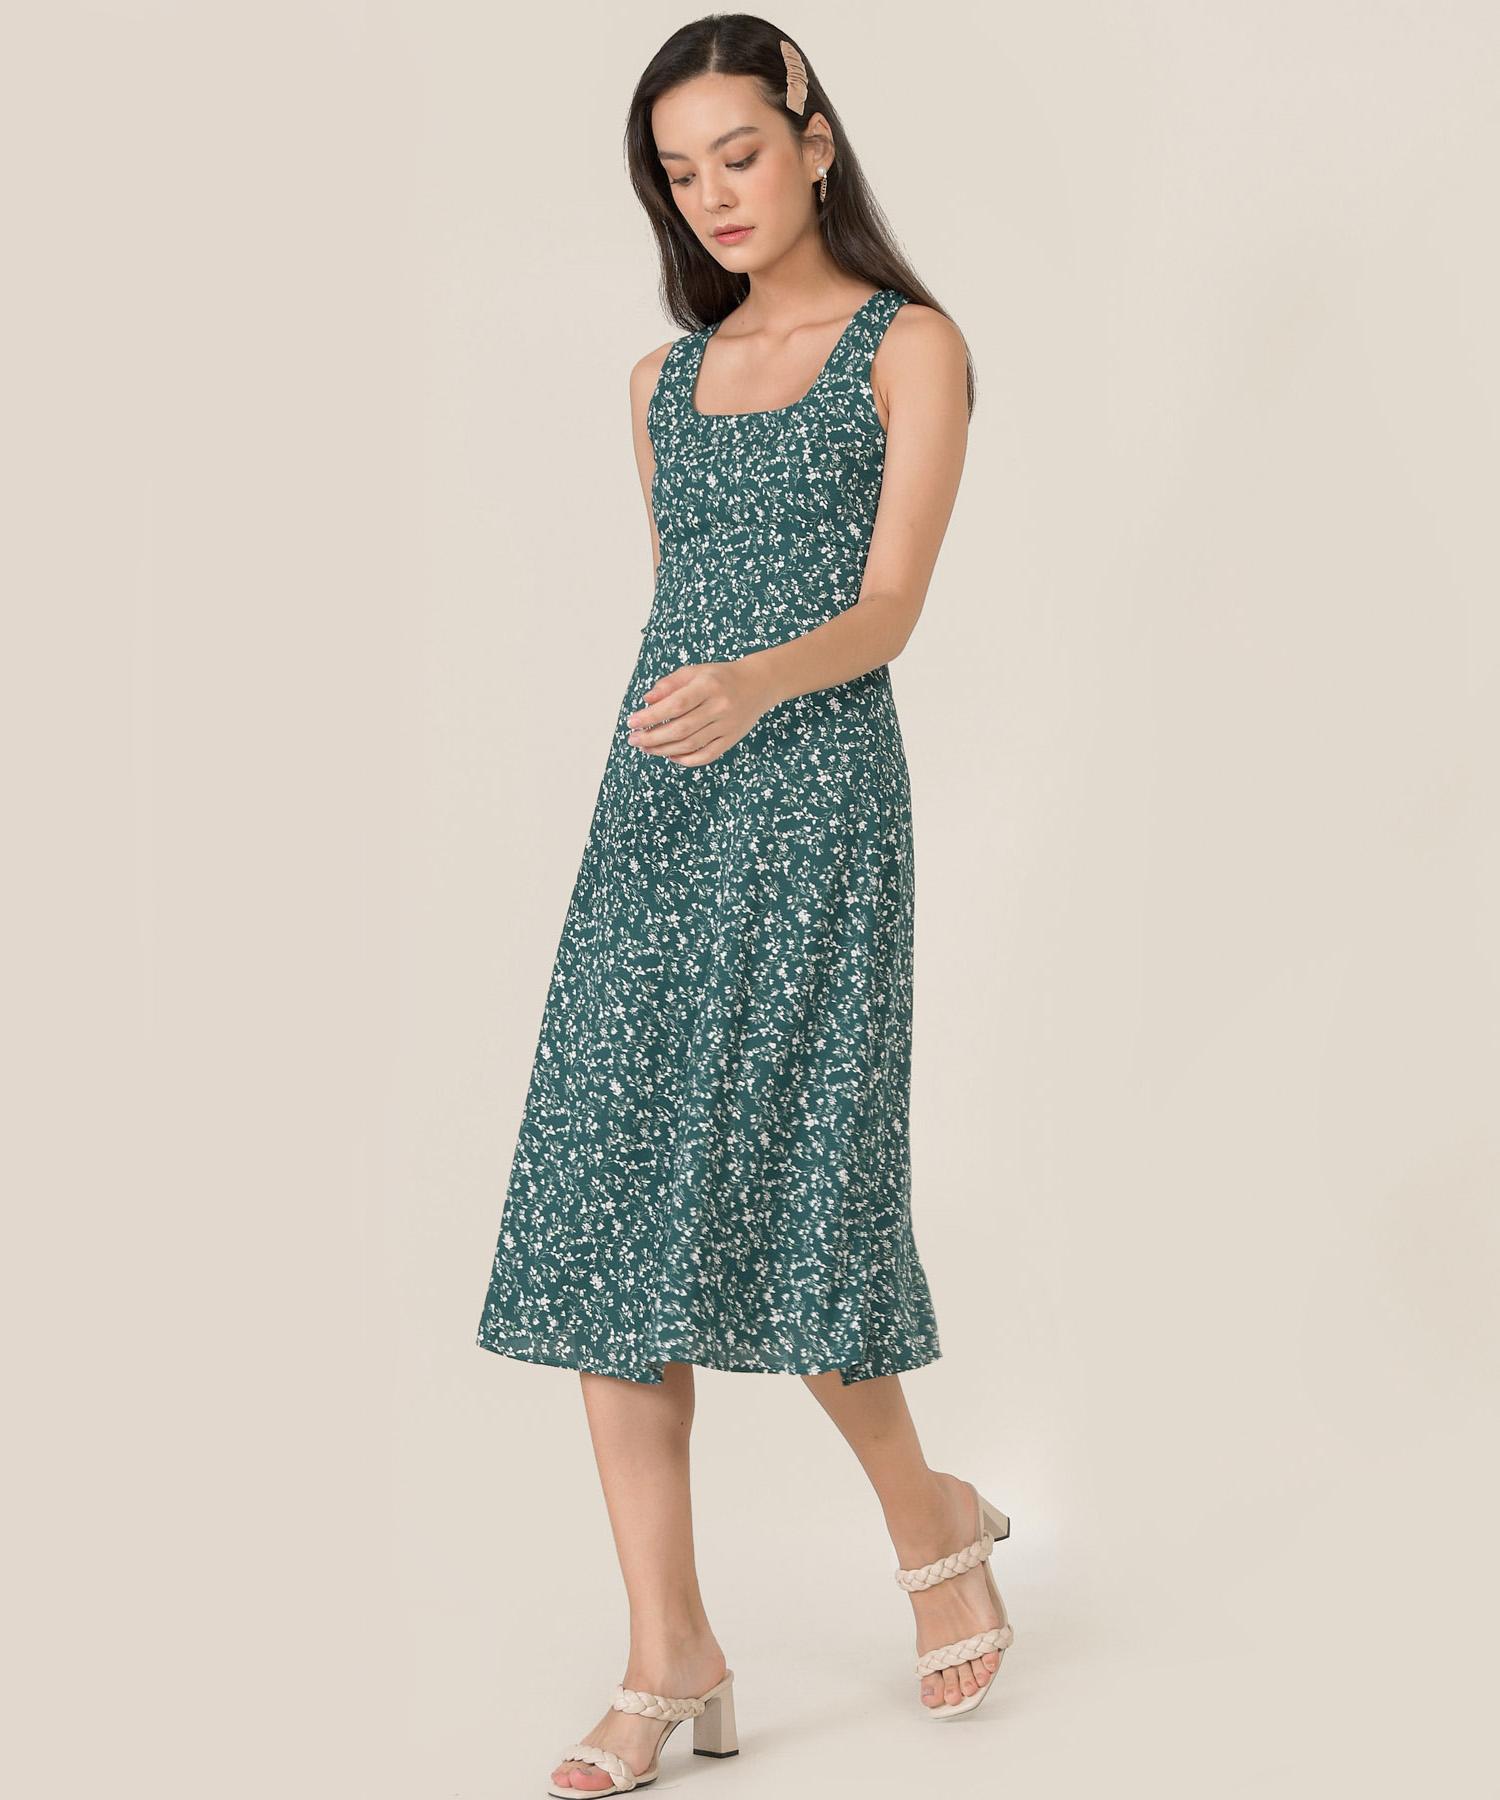 zeta-floral-square-neck-midi-dress-pine-1